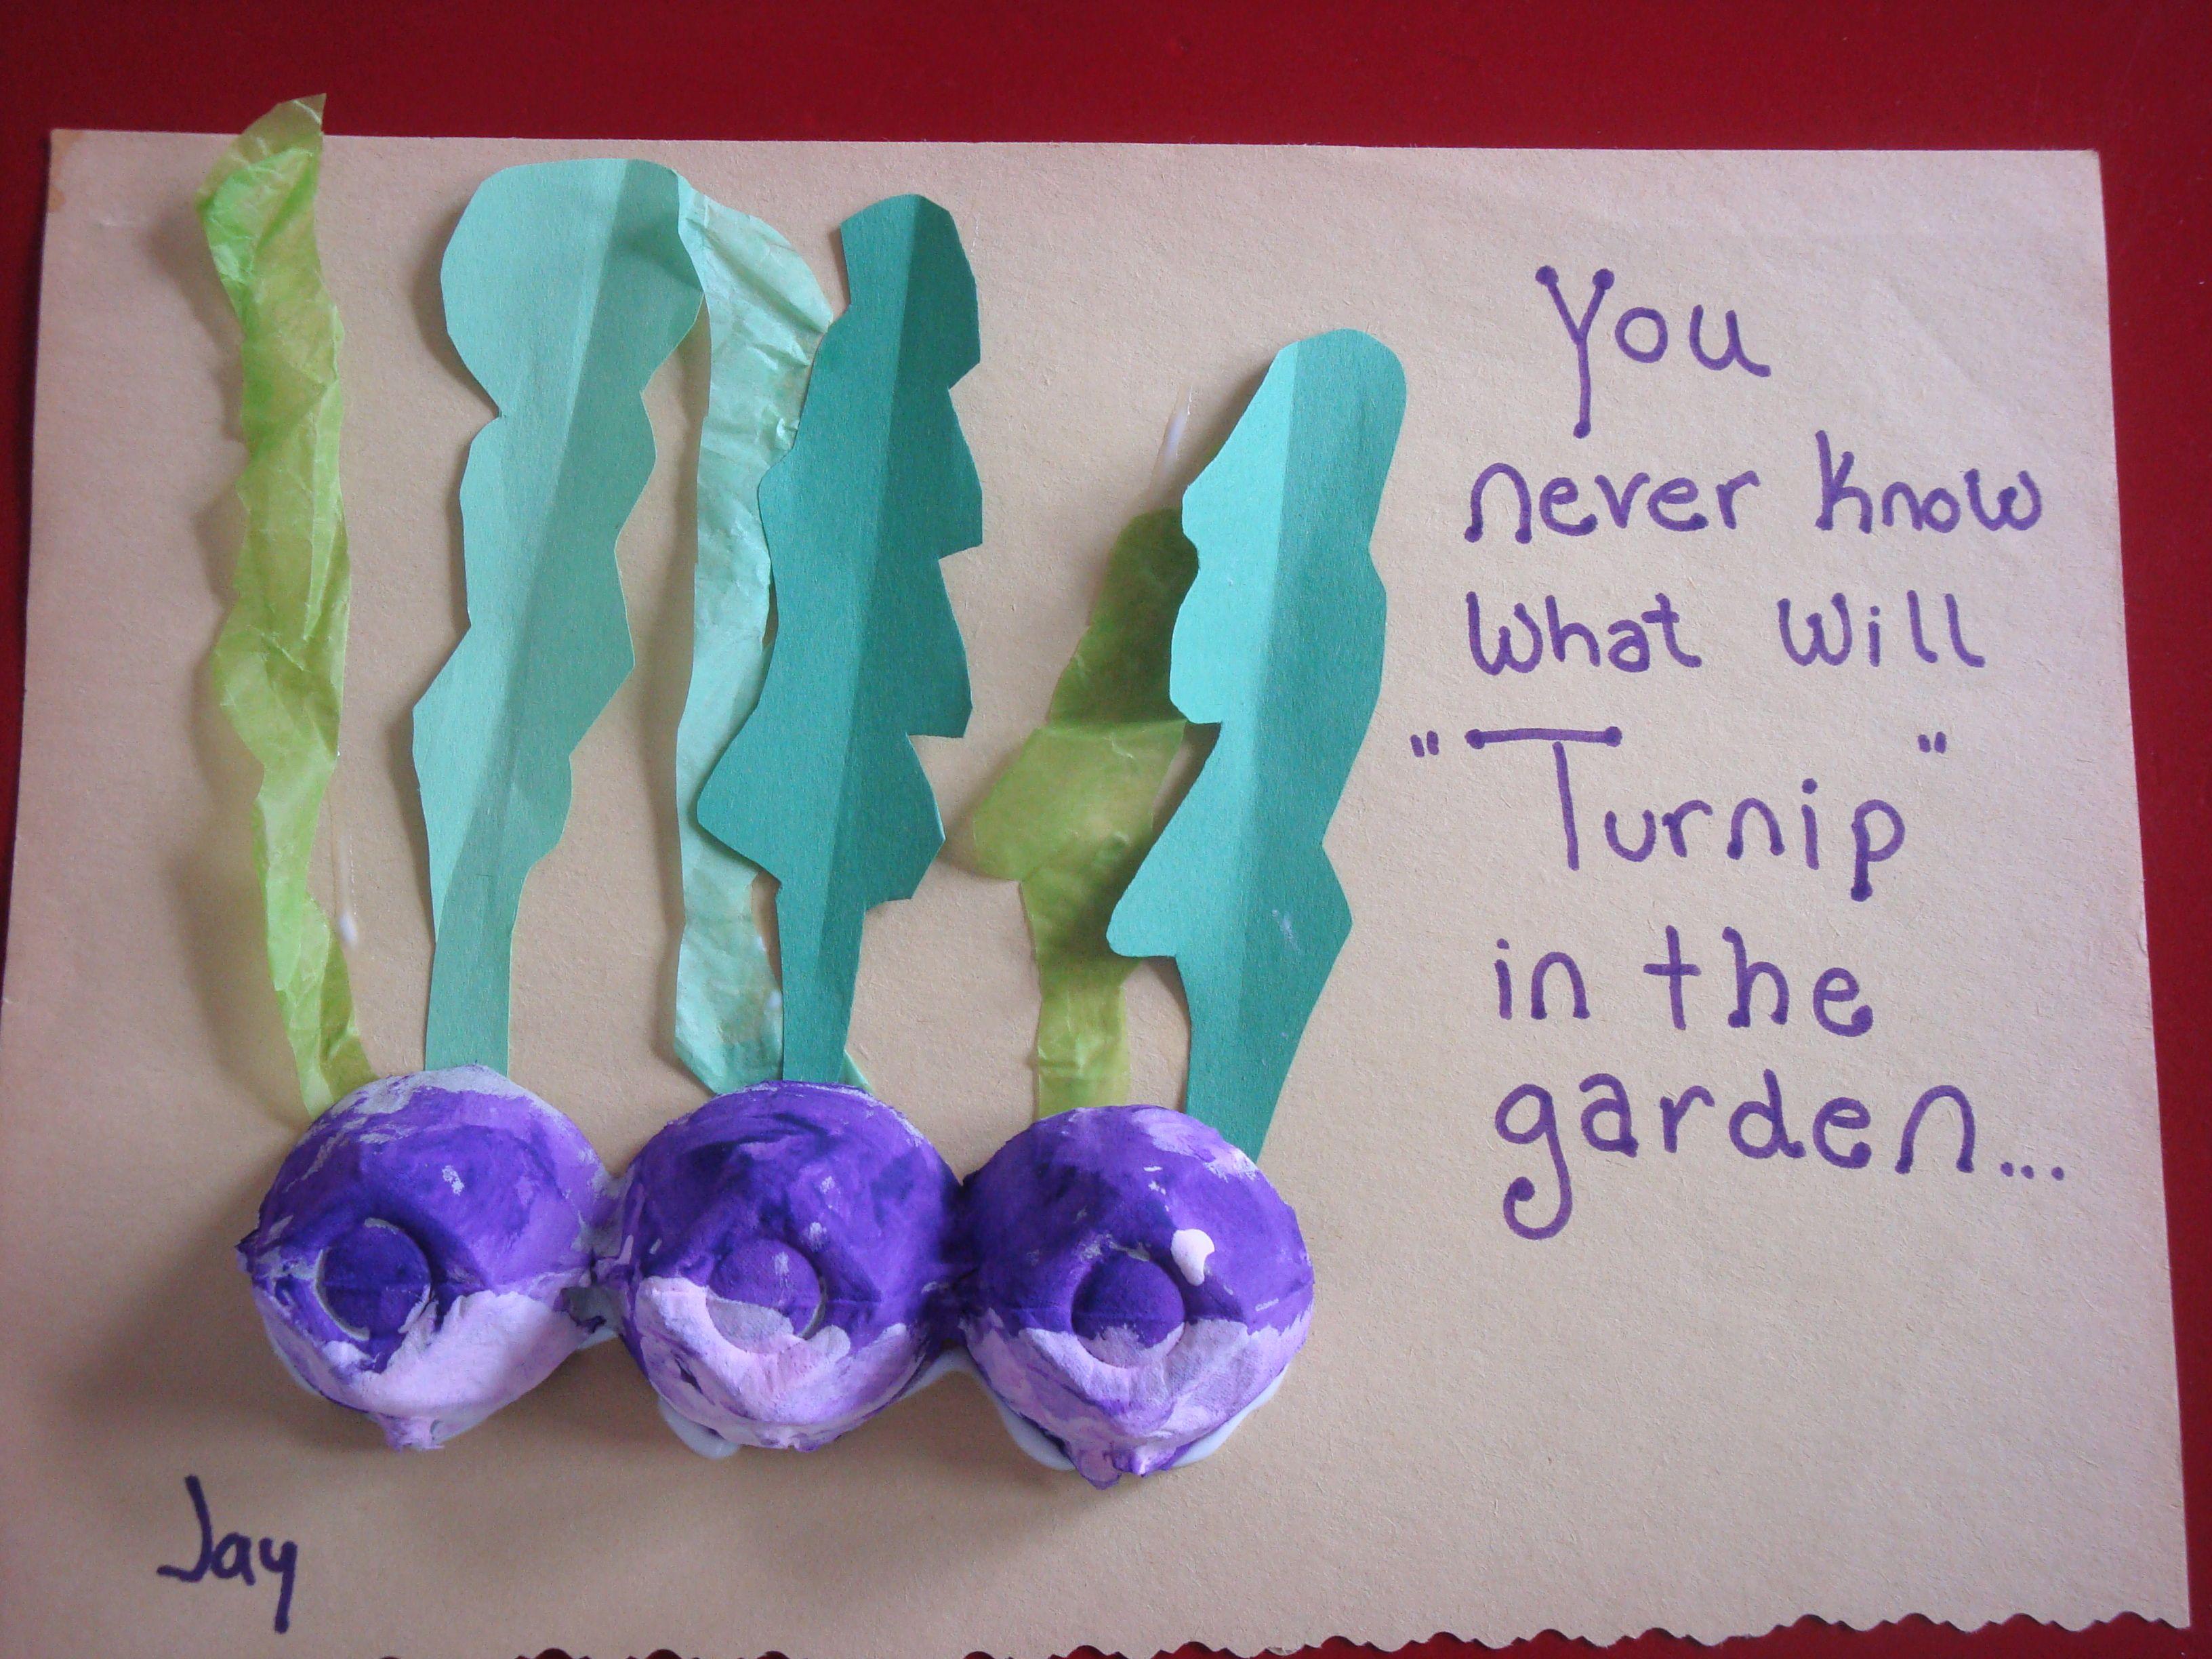 The Playful Garden Egg Carton Turnips